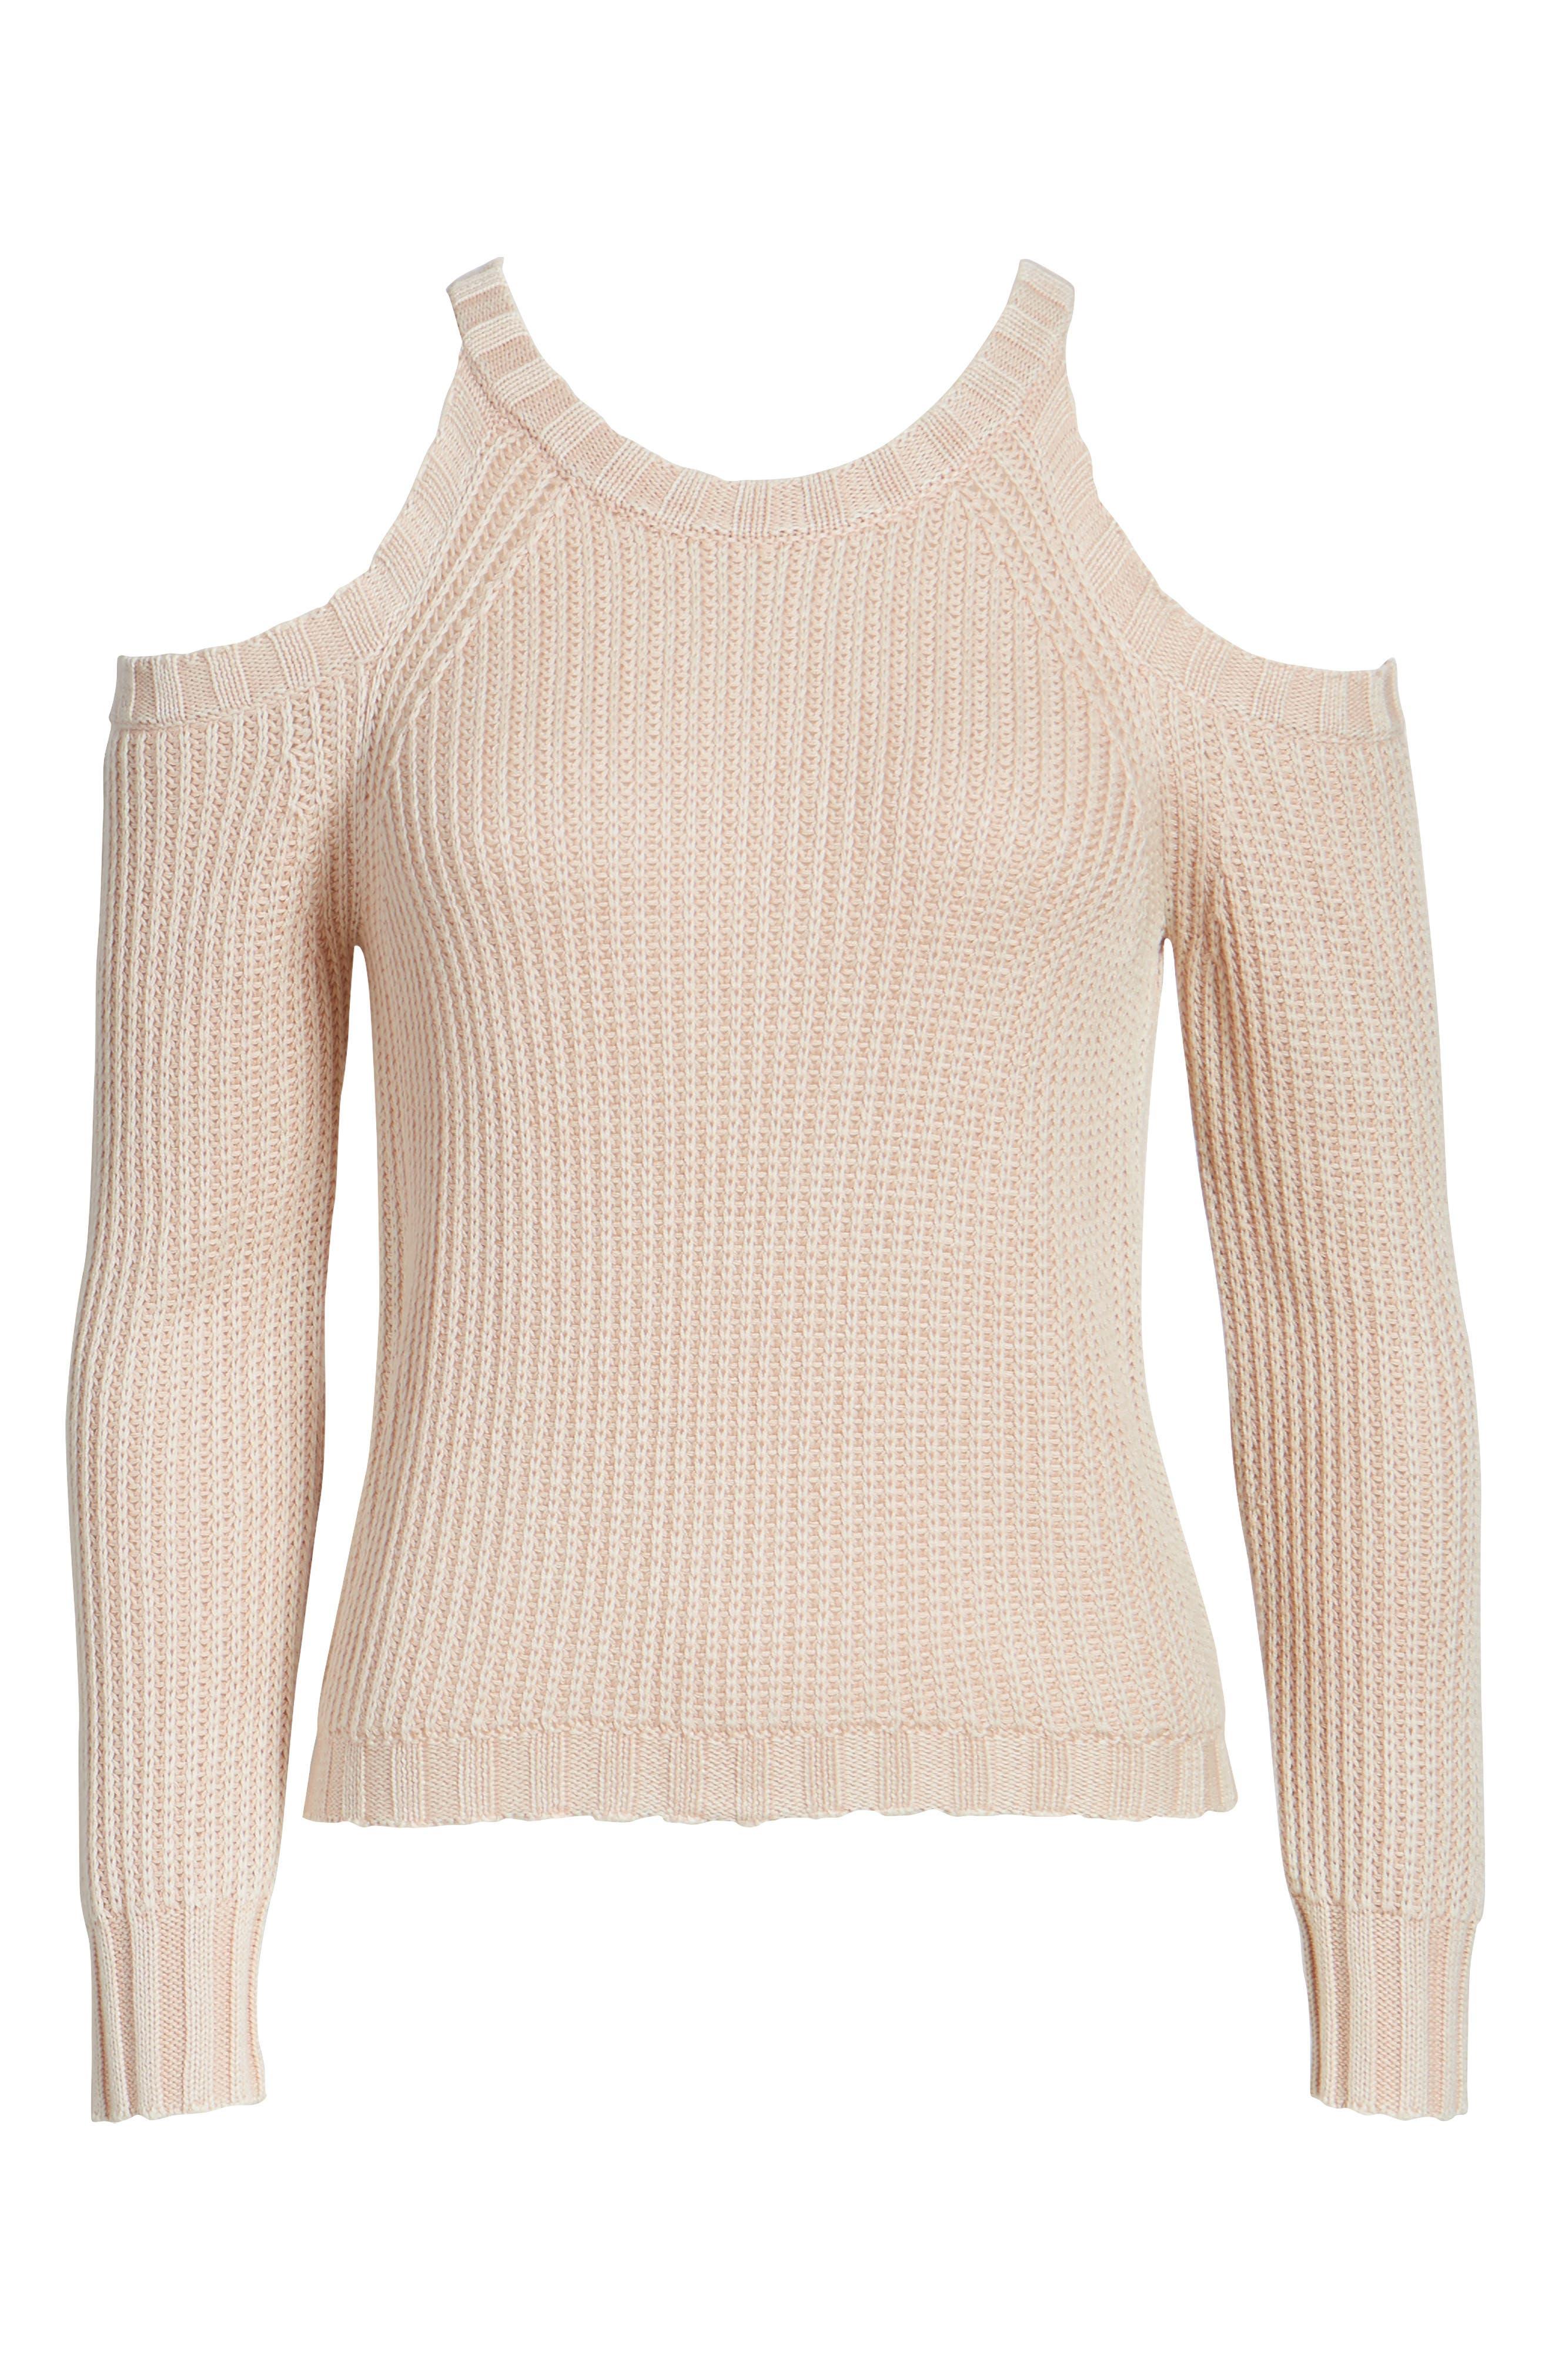 Mika Cold Shoulder Sweater,                             Alternate thumbnail 6, color,                             Blush